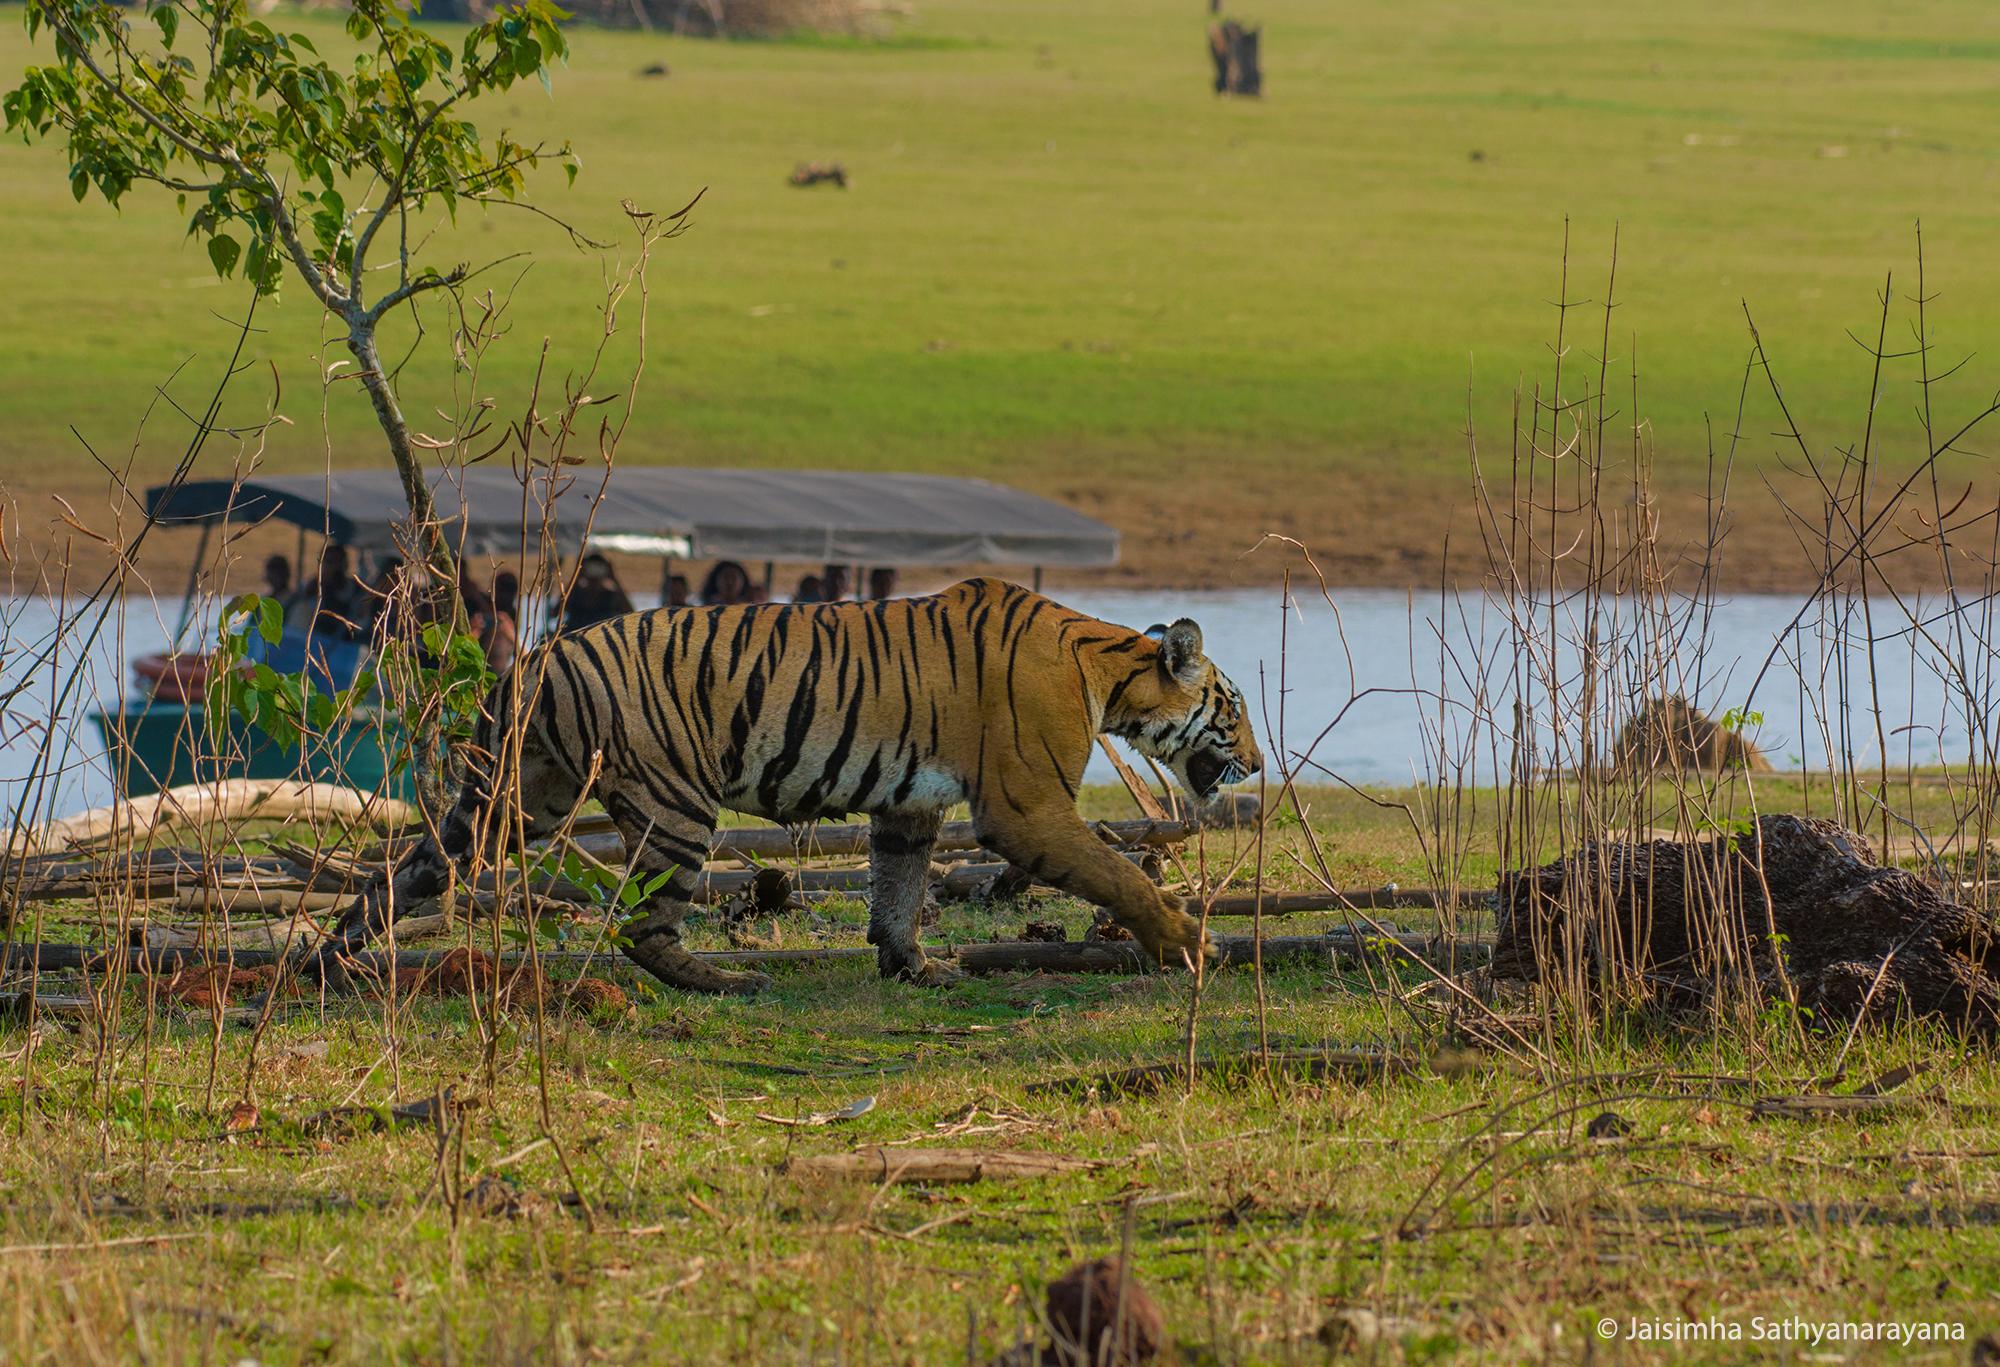 Tiger Kabini, Jaisimha Sathyanarayana